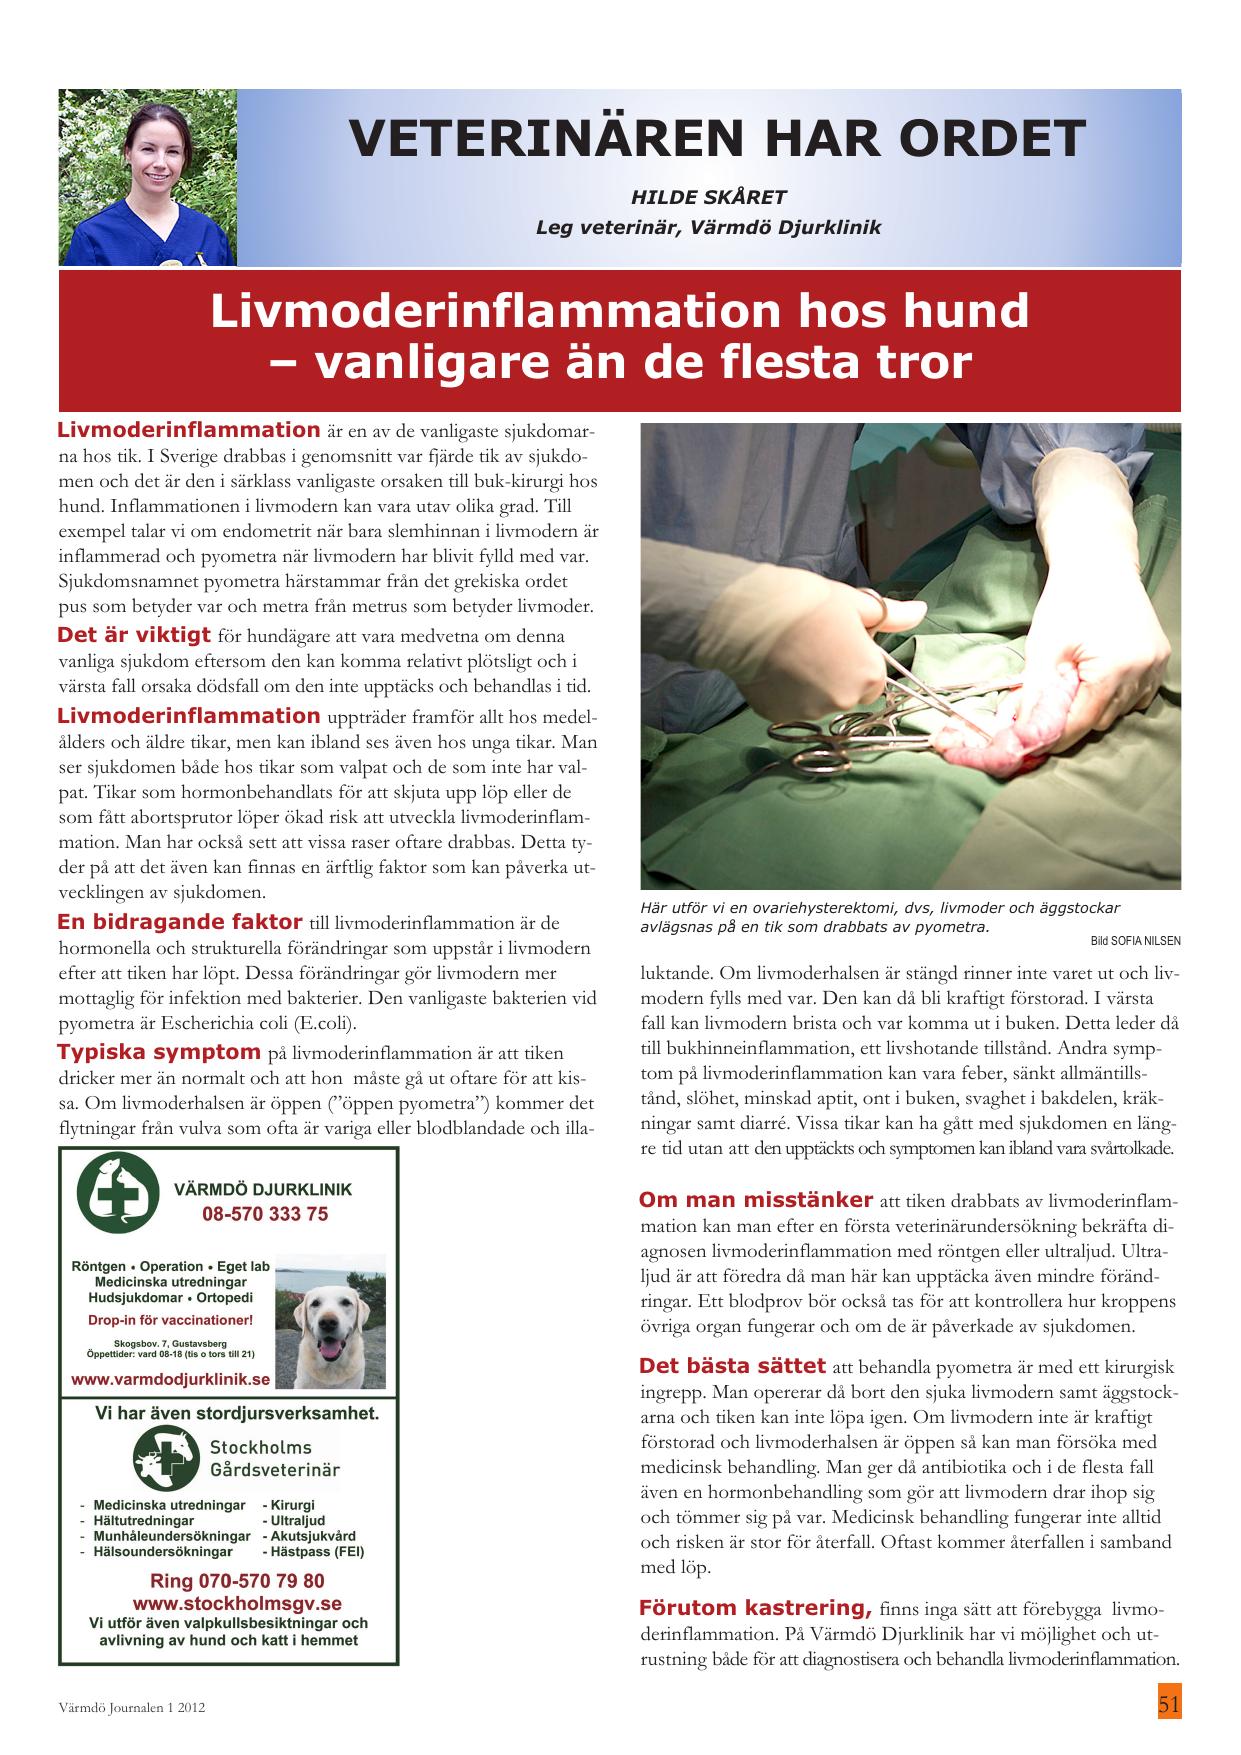 Livmoderinflammation